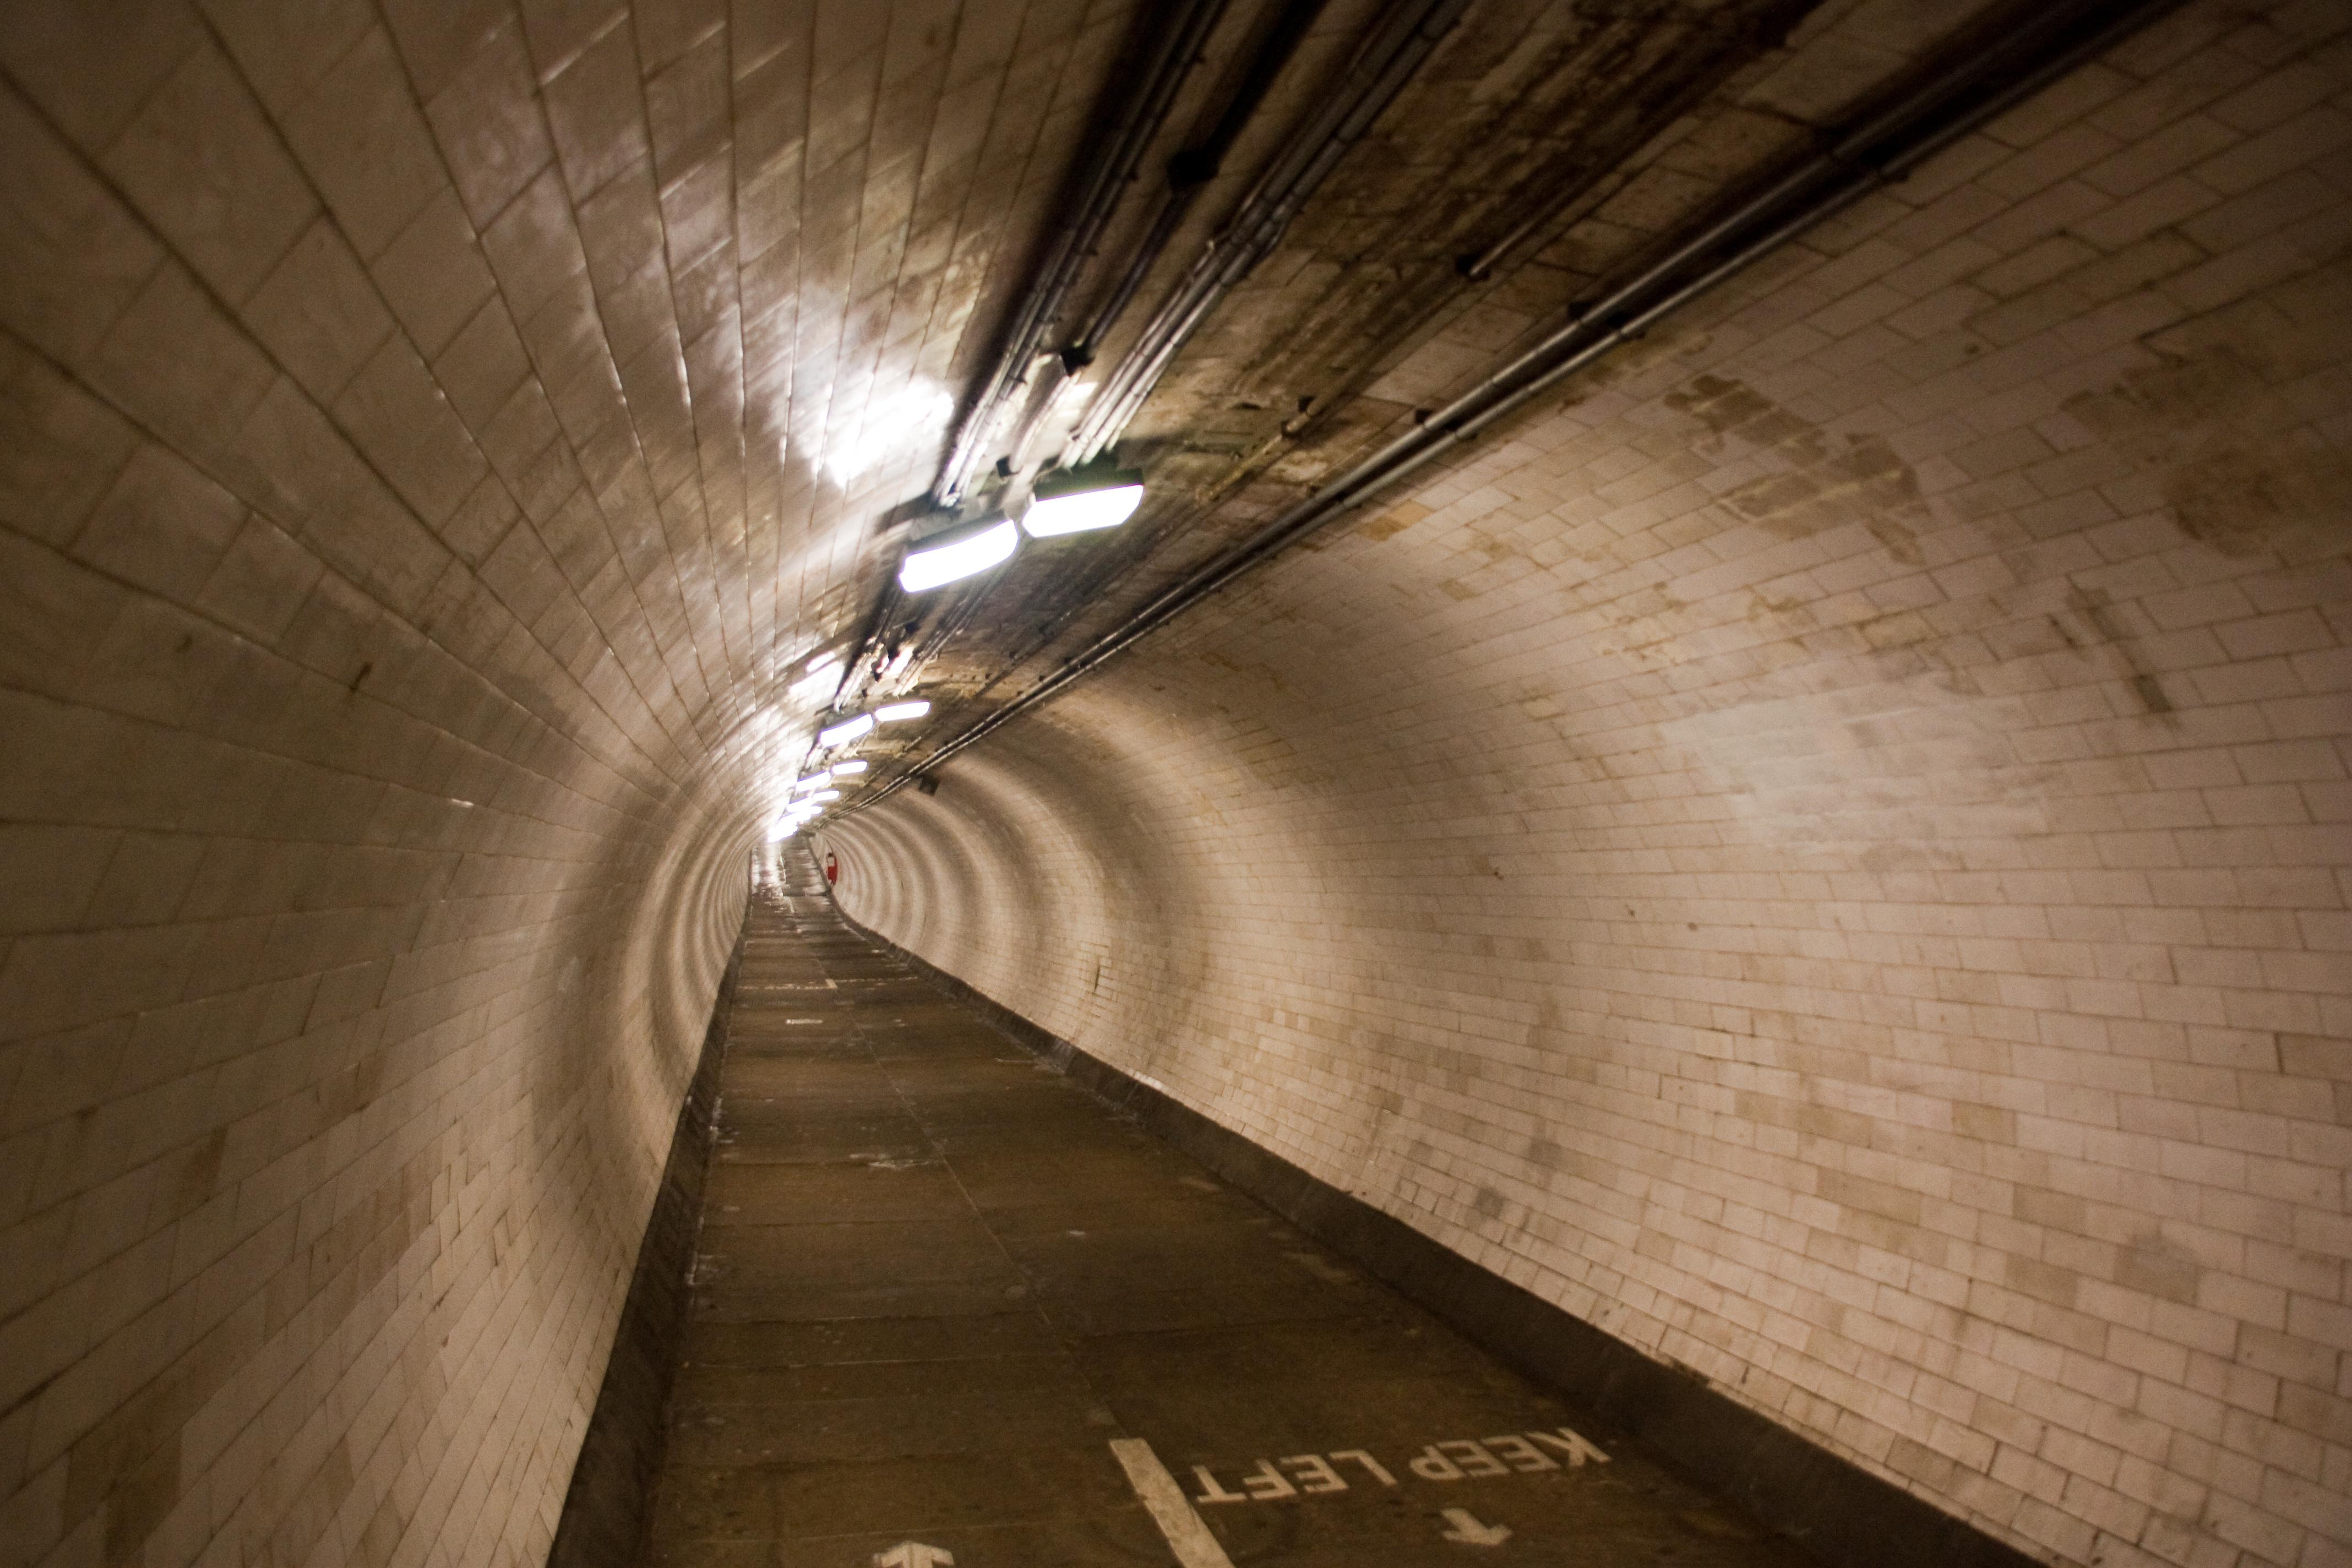 File:Tunnel-Pieton-Greenwich IMG 7874 jpg - Wikimedia Commons